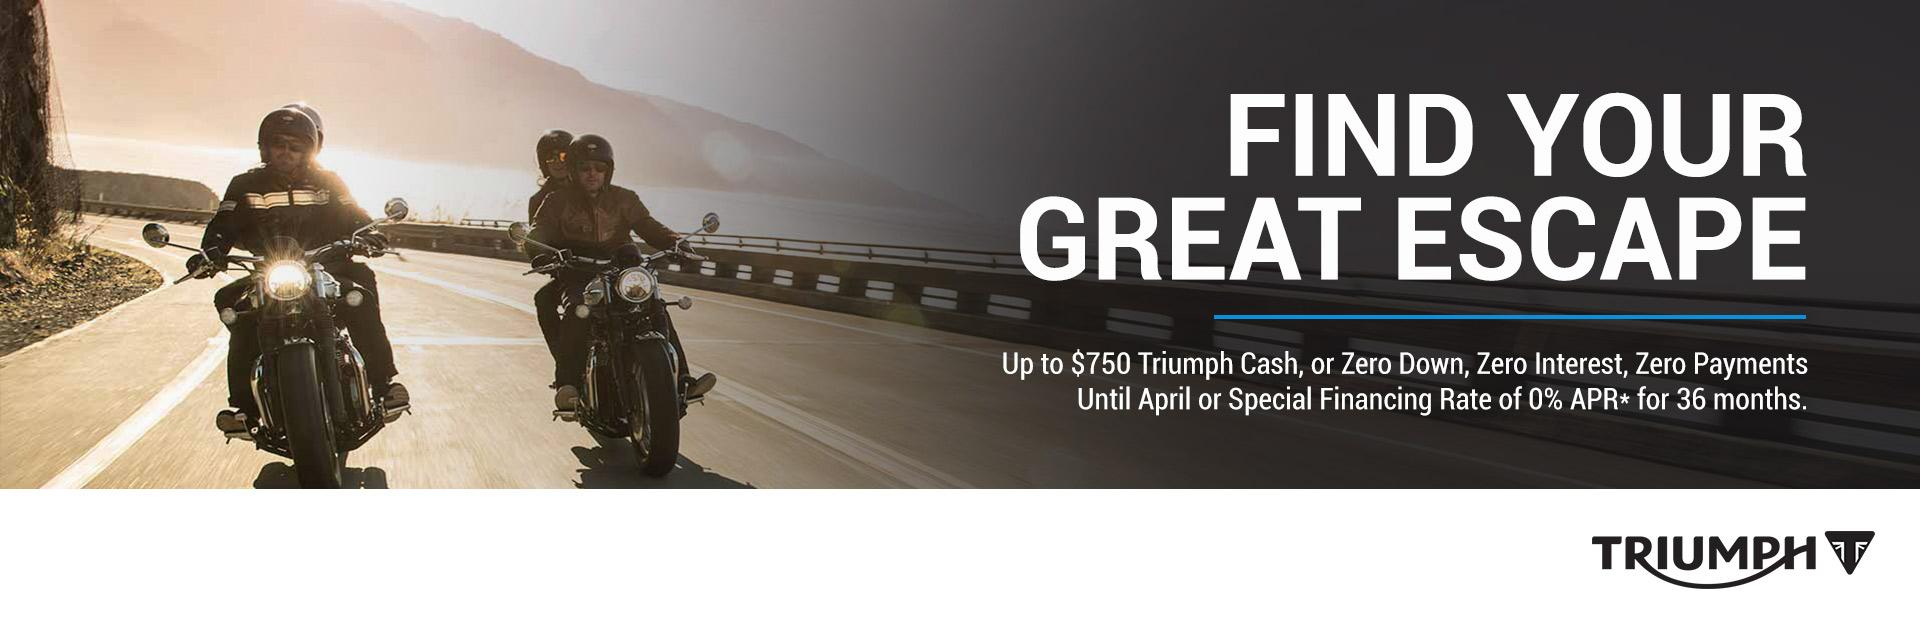 Triumph: Find Your Great Escape